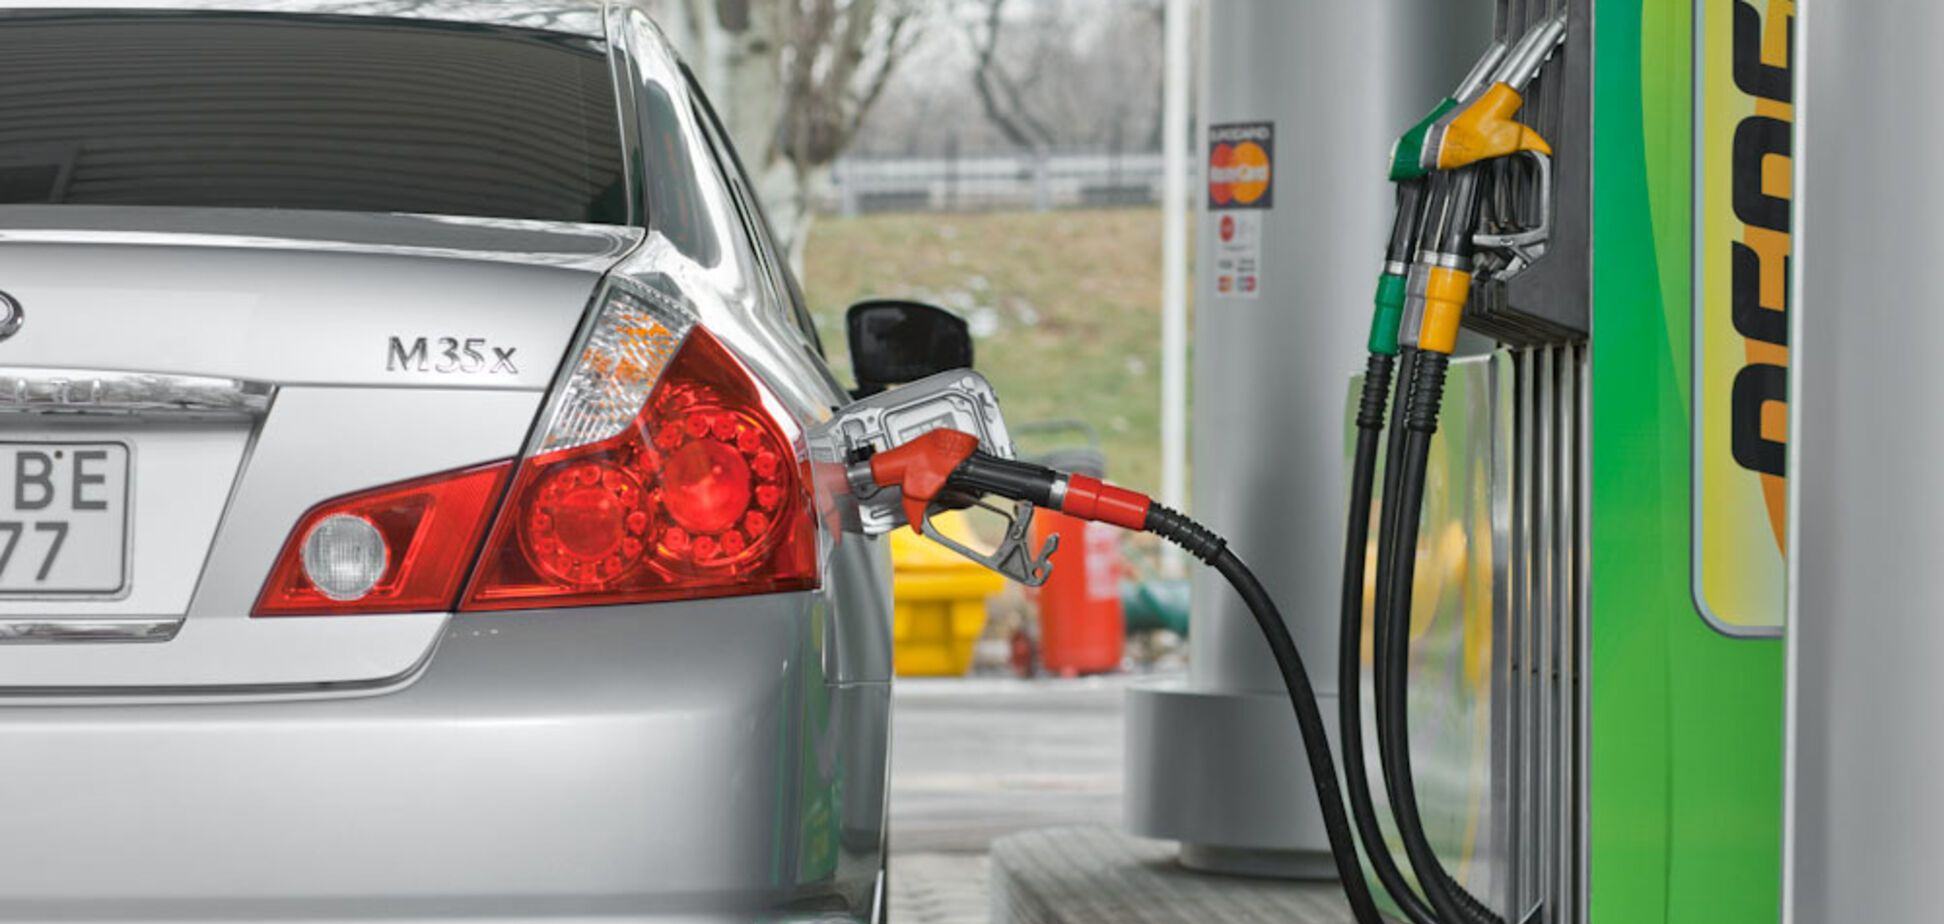 Россия прекратит поставки бензина? Озвучен прогноз по ценам в Украине